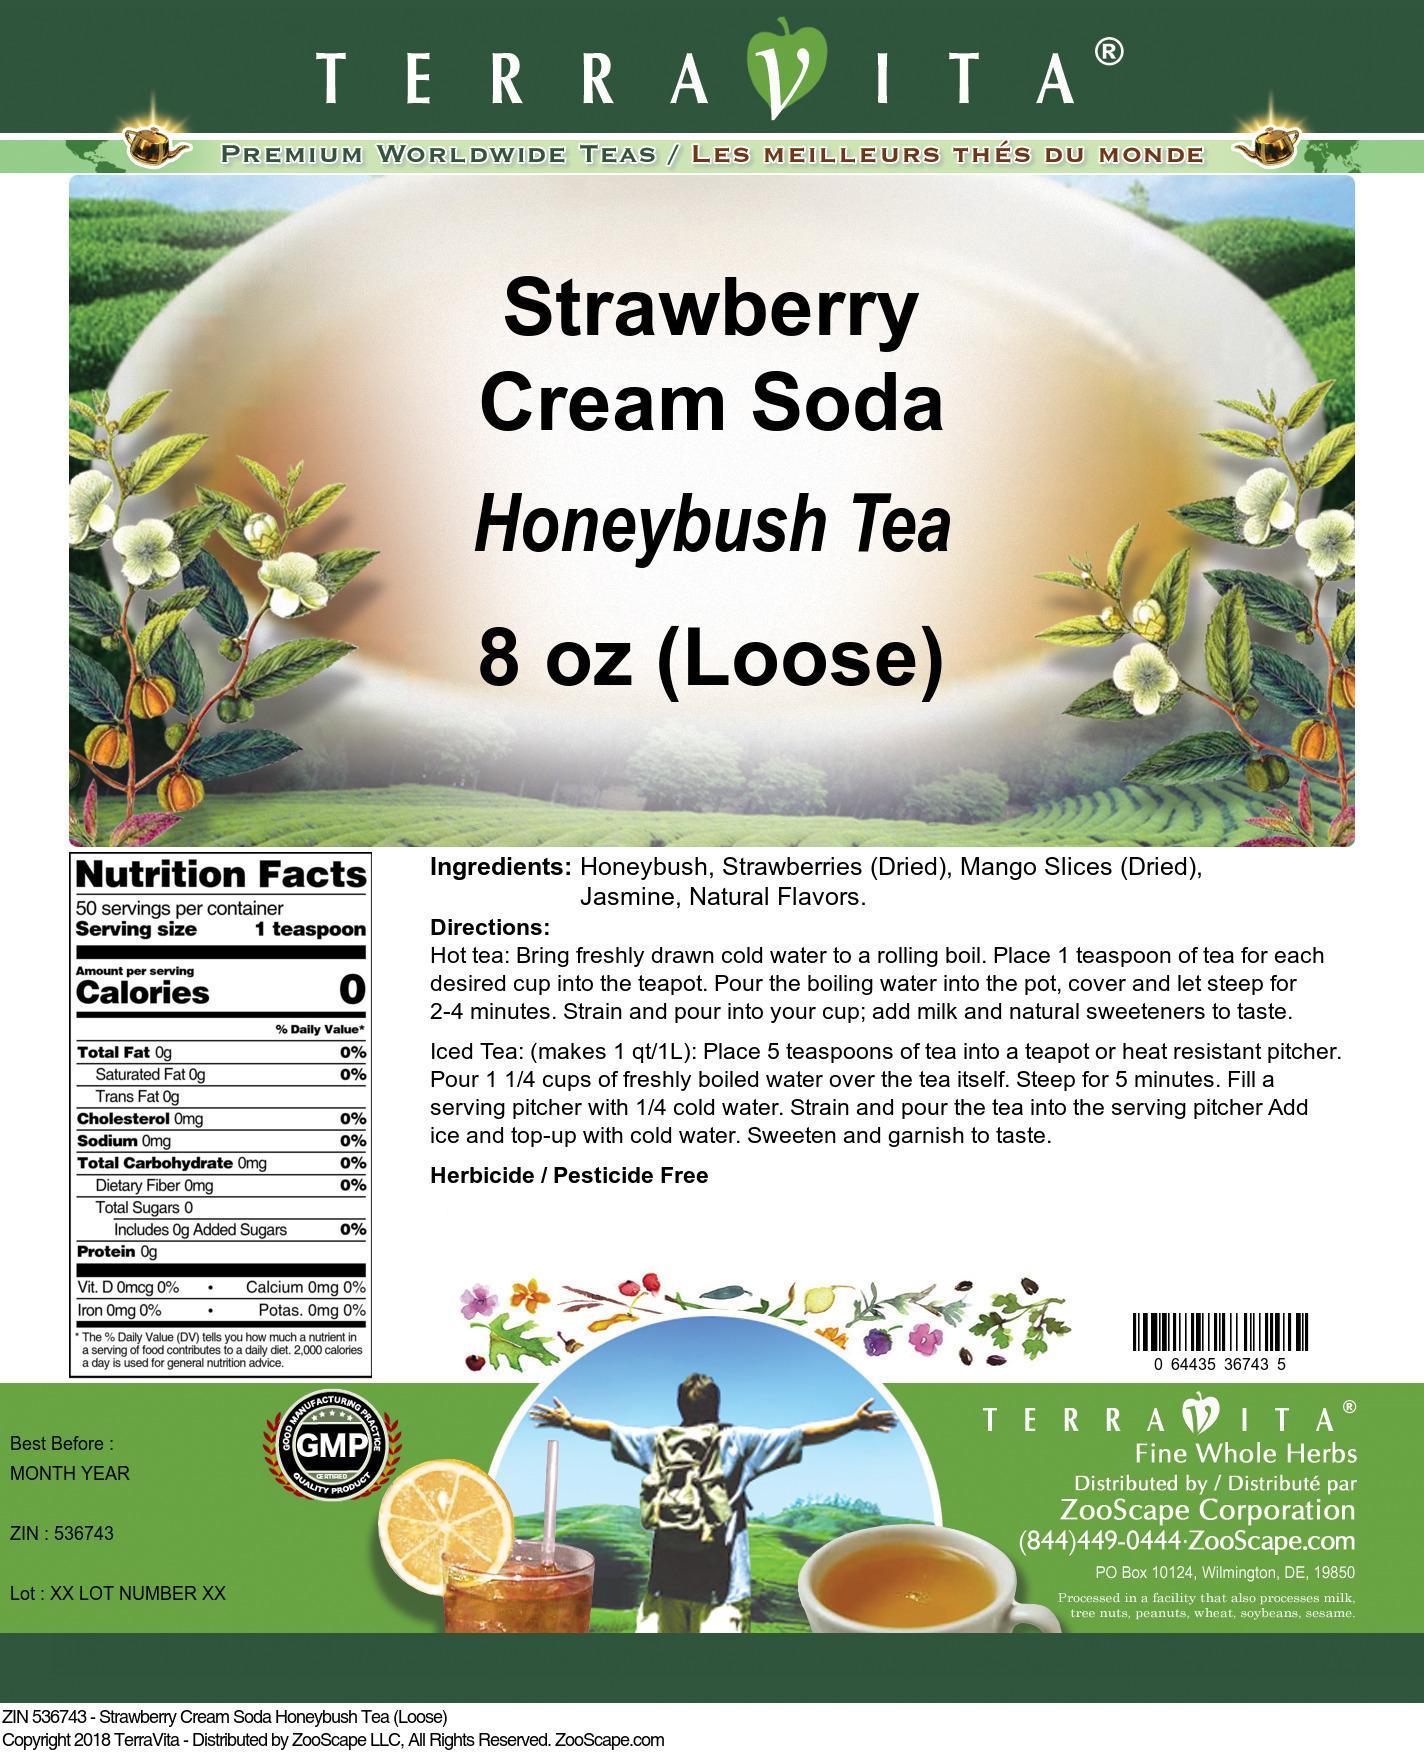 Strawberry Cream Soda Honeybush Tea (Loose)